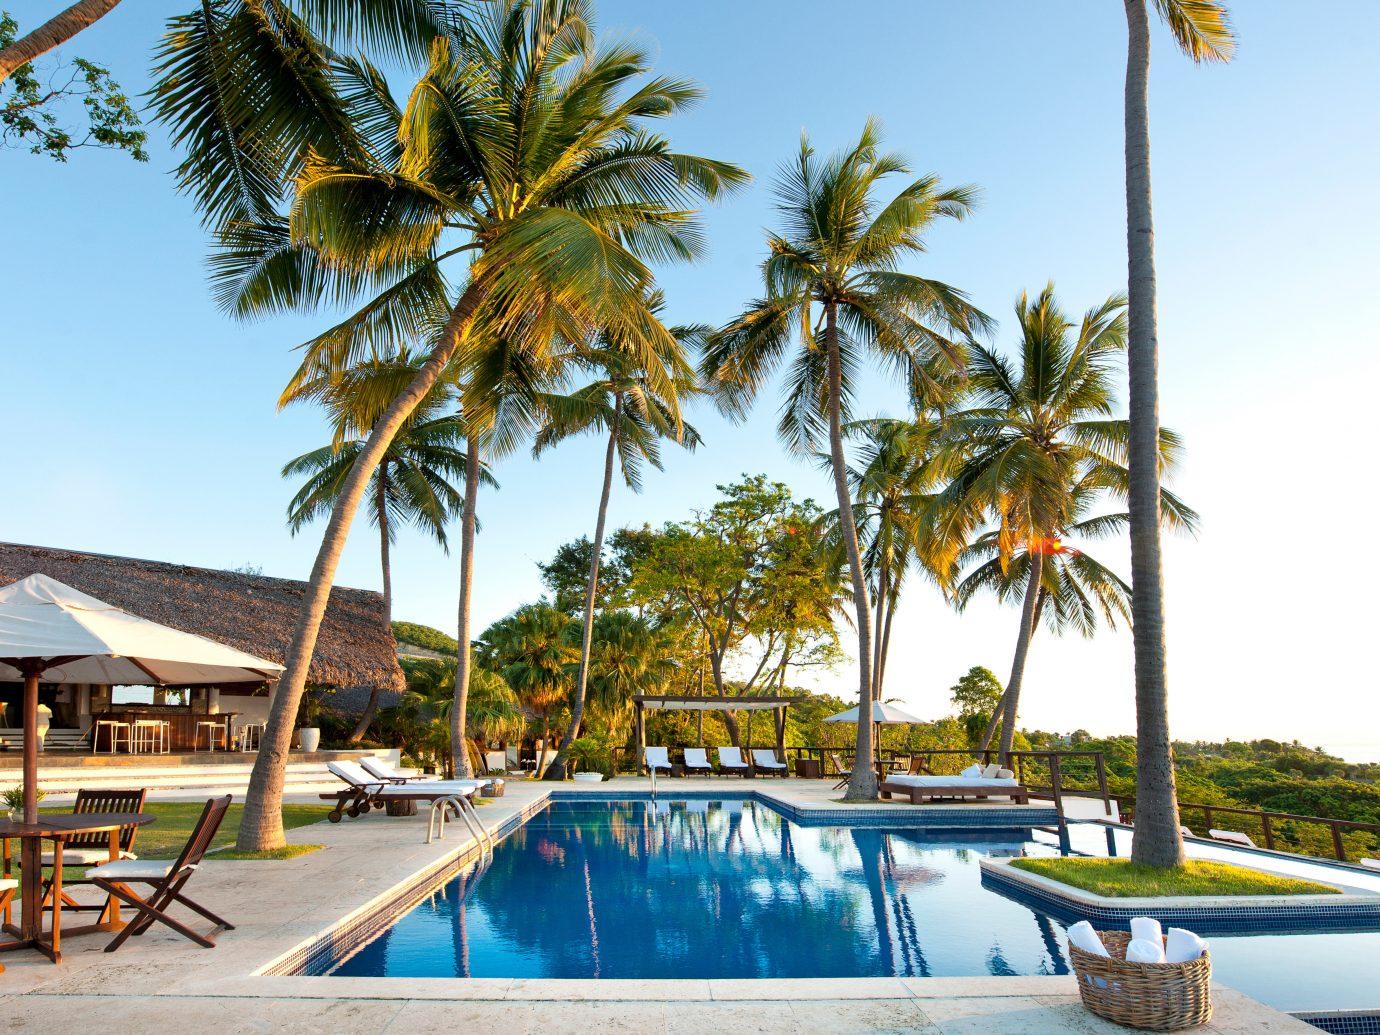 Pool At Casa Bonita Tropical Lodge In Bahoruco Barahona, Dominican Republic